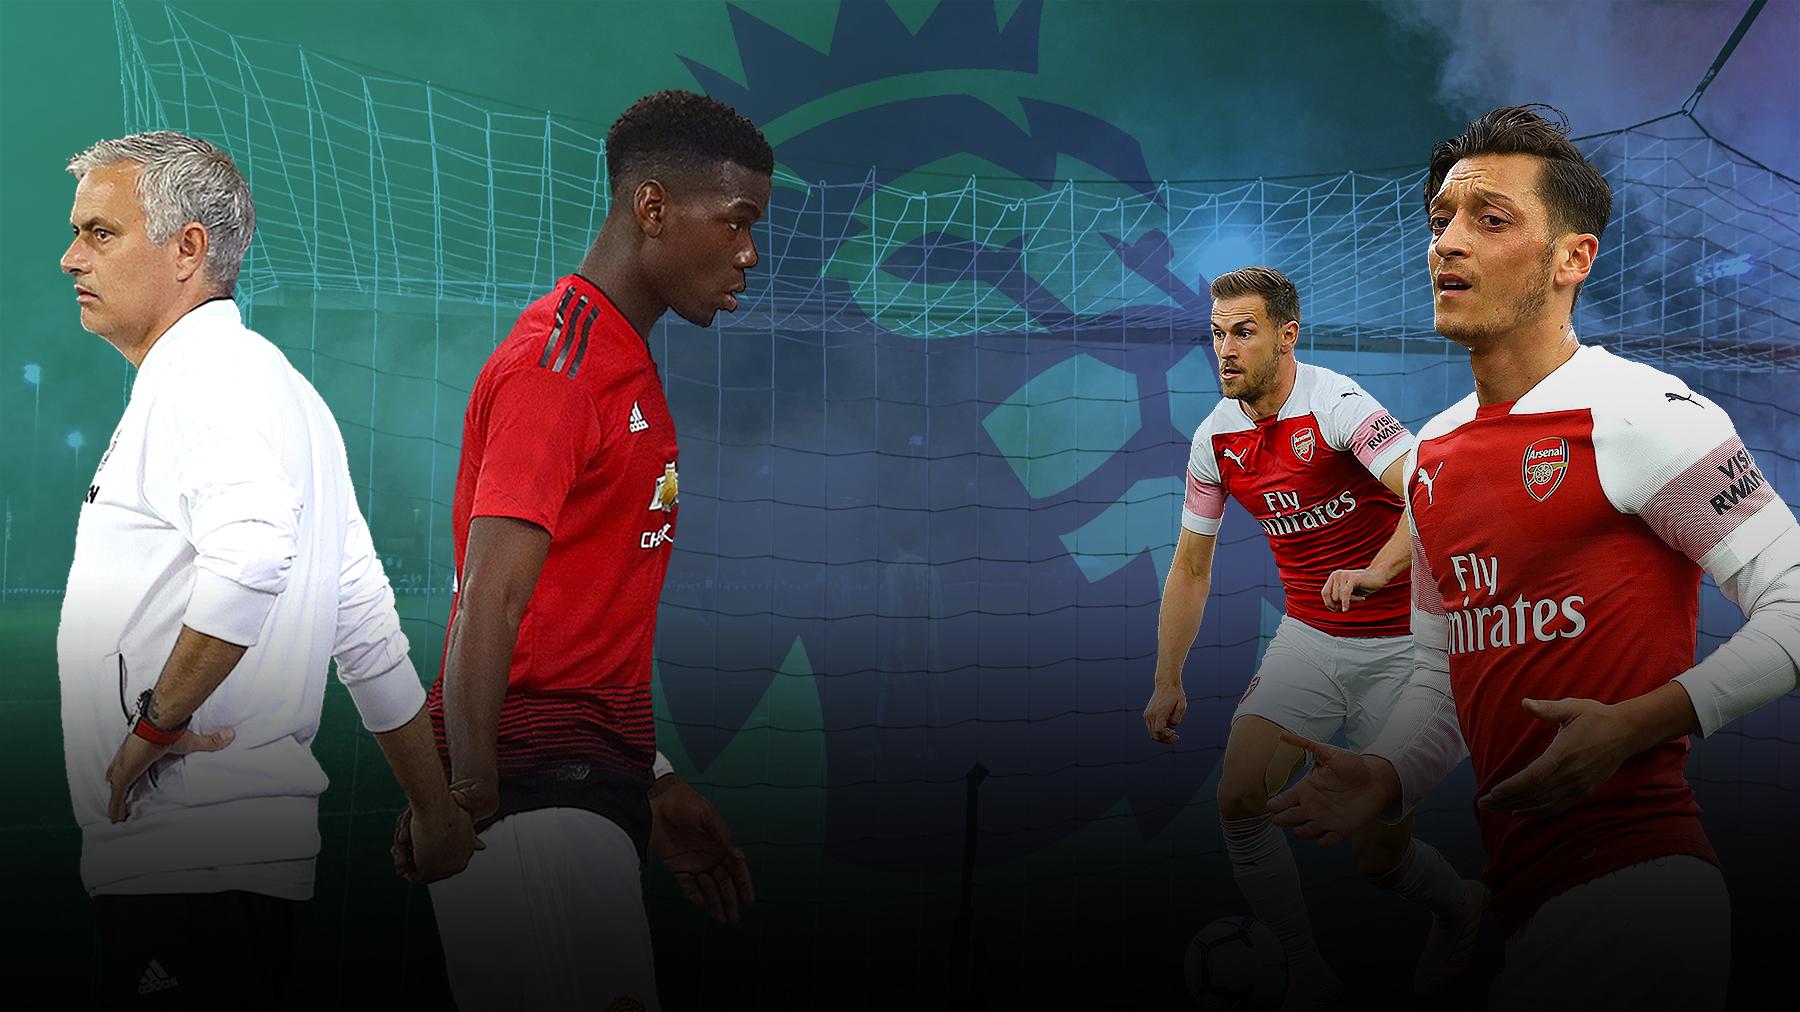 Will Jose Mourinho drop Paul Pogba and has Mesut Ozil won his battle with Aaron Ramsey?